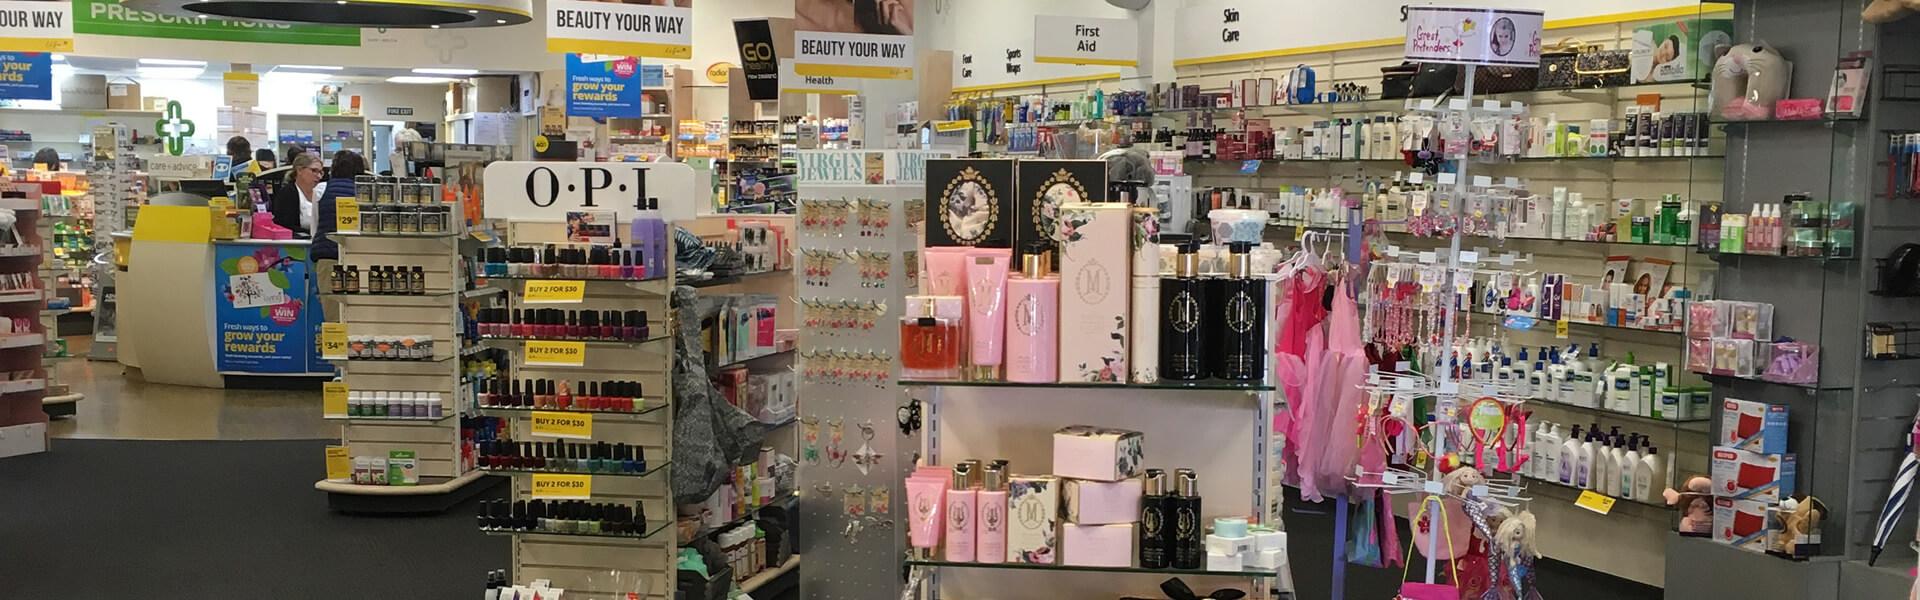 Store Interior 01 At Life Pharmacy Blenheim In Marlborough NZ